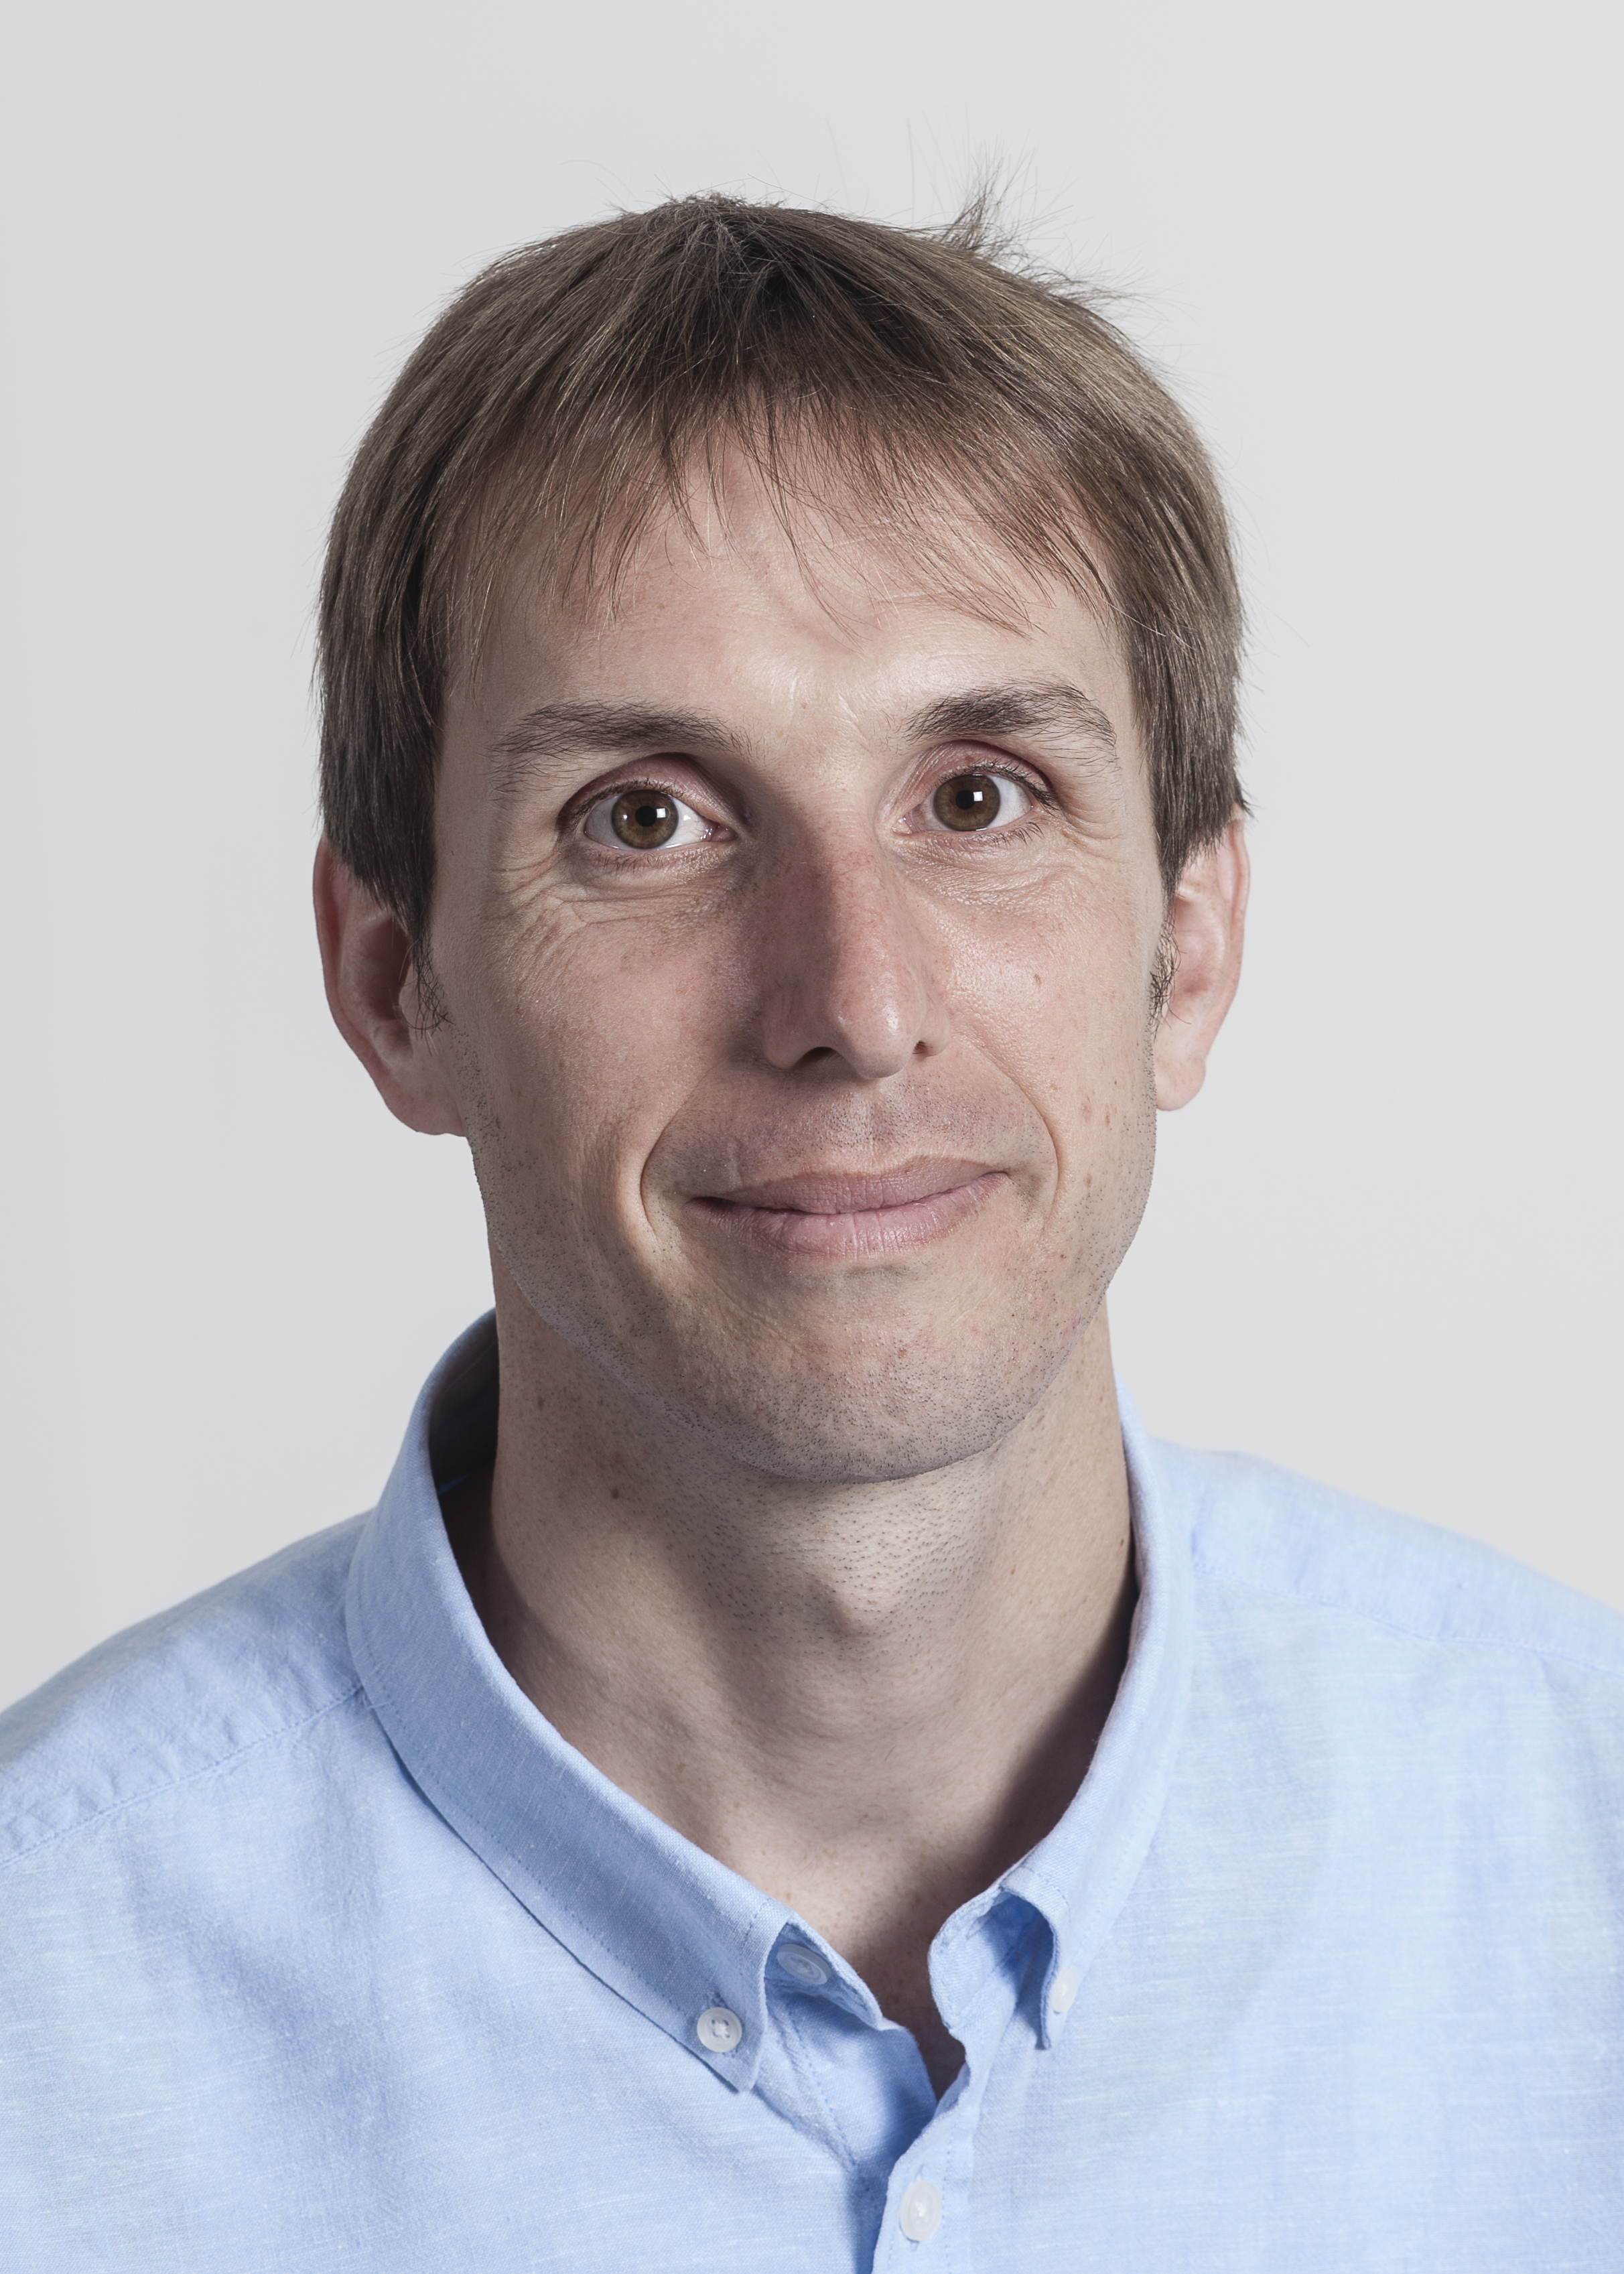 Adrian Weber